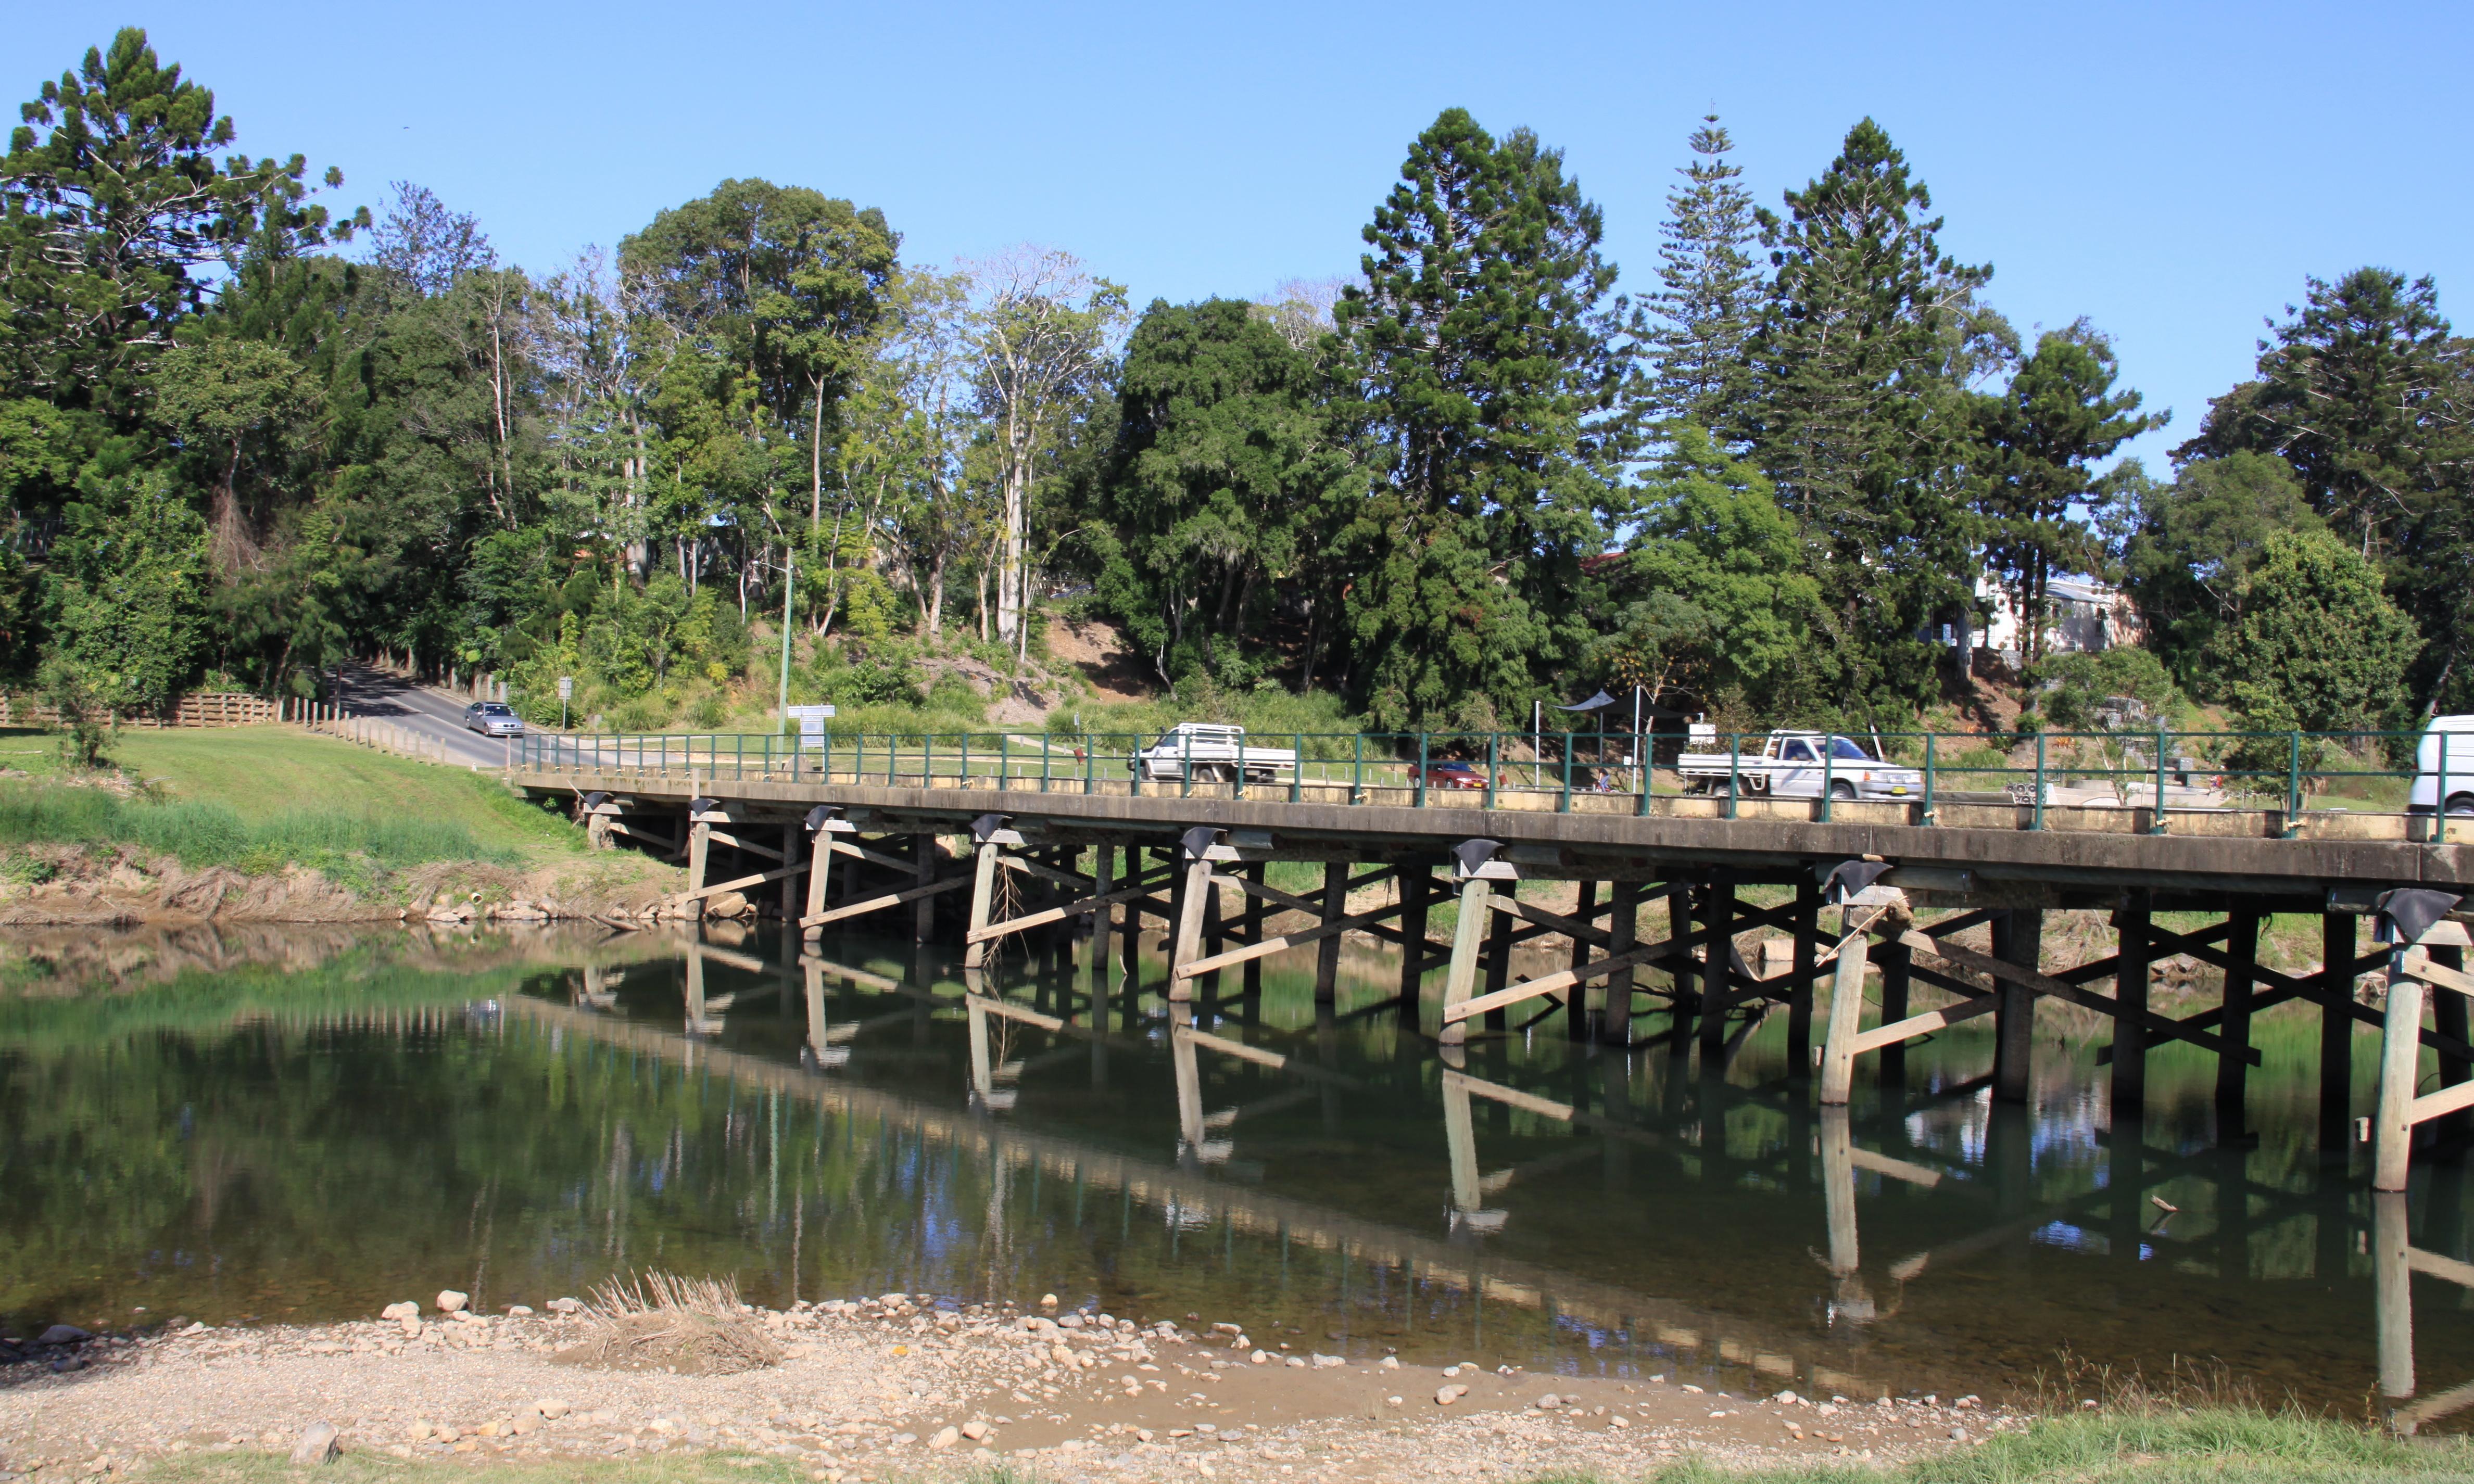 NSW coastal towns face anxious wait for rain as water supplies dwindle